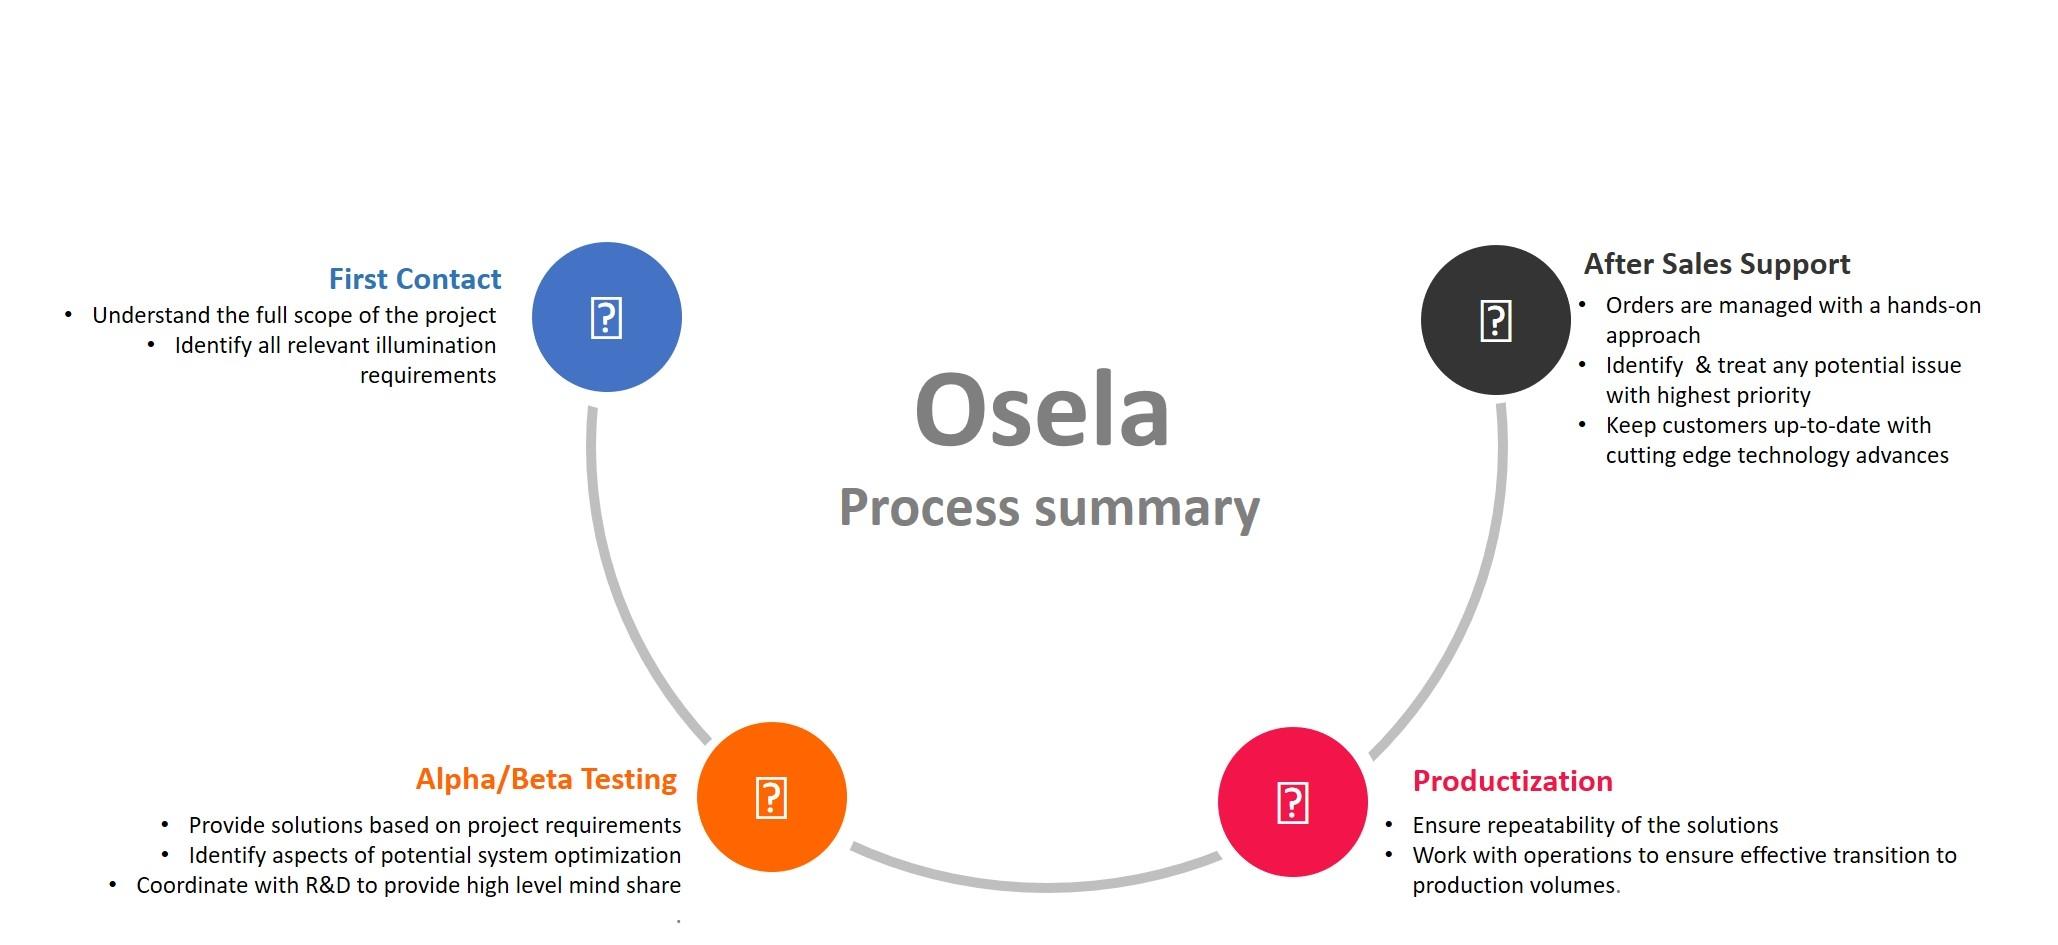 Osela sales process summary